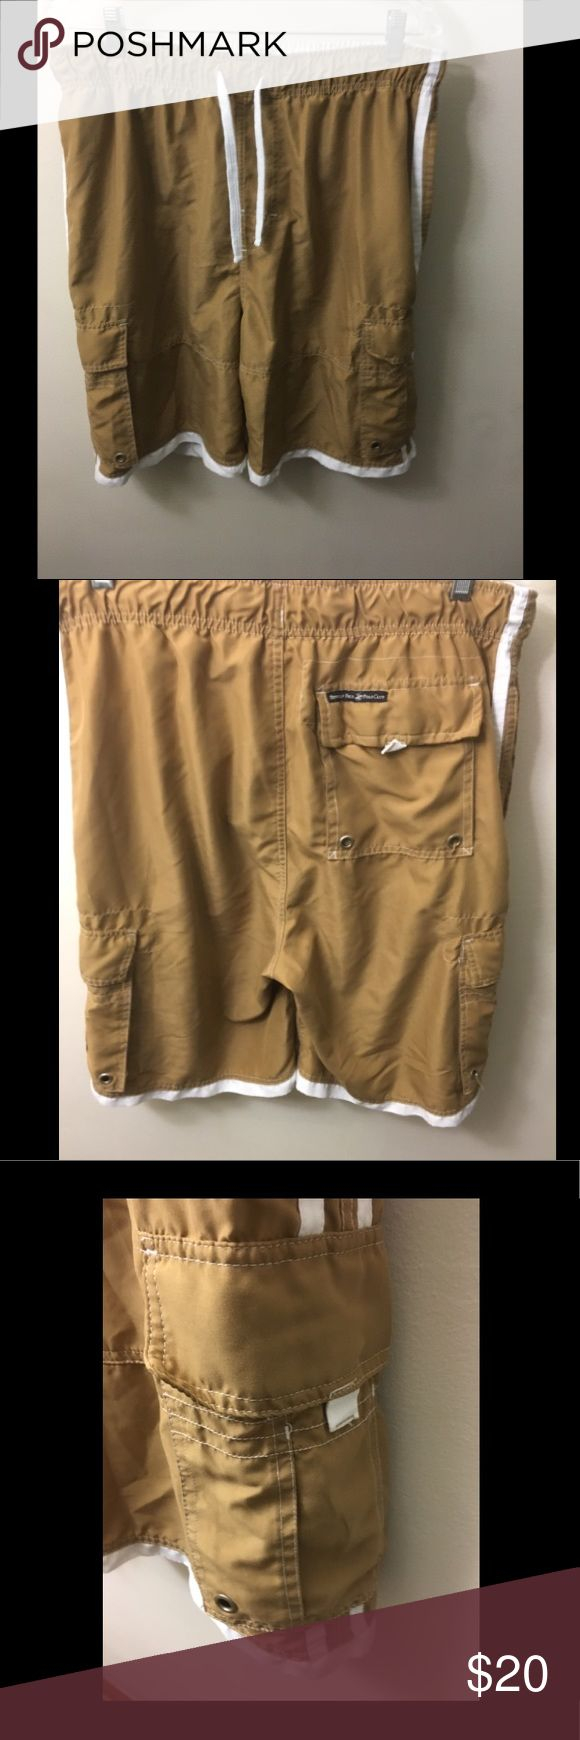 Men's swim shorts Camel color swim trunks with multi pockets. Polo by Ralph Lauren Swim Swim Trunks